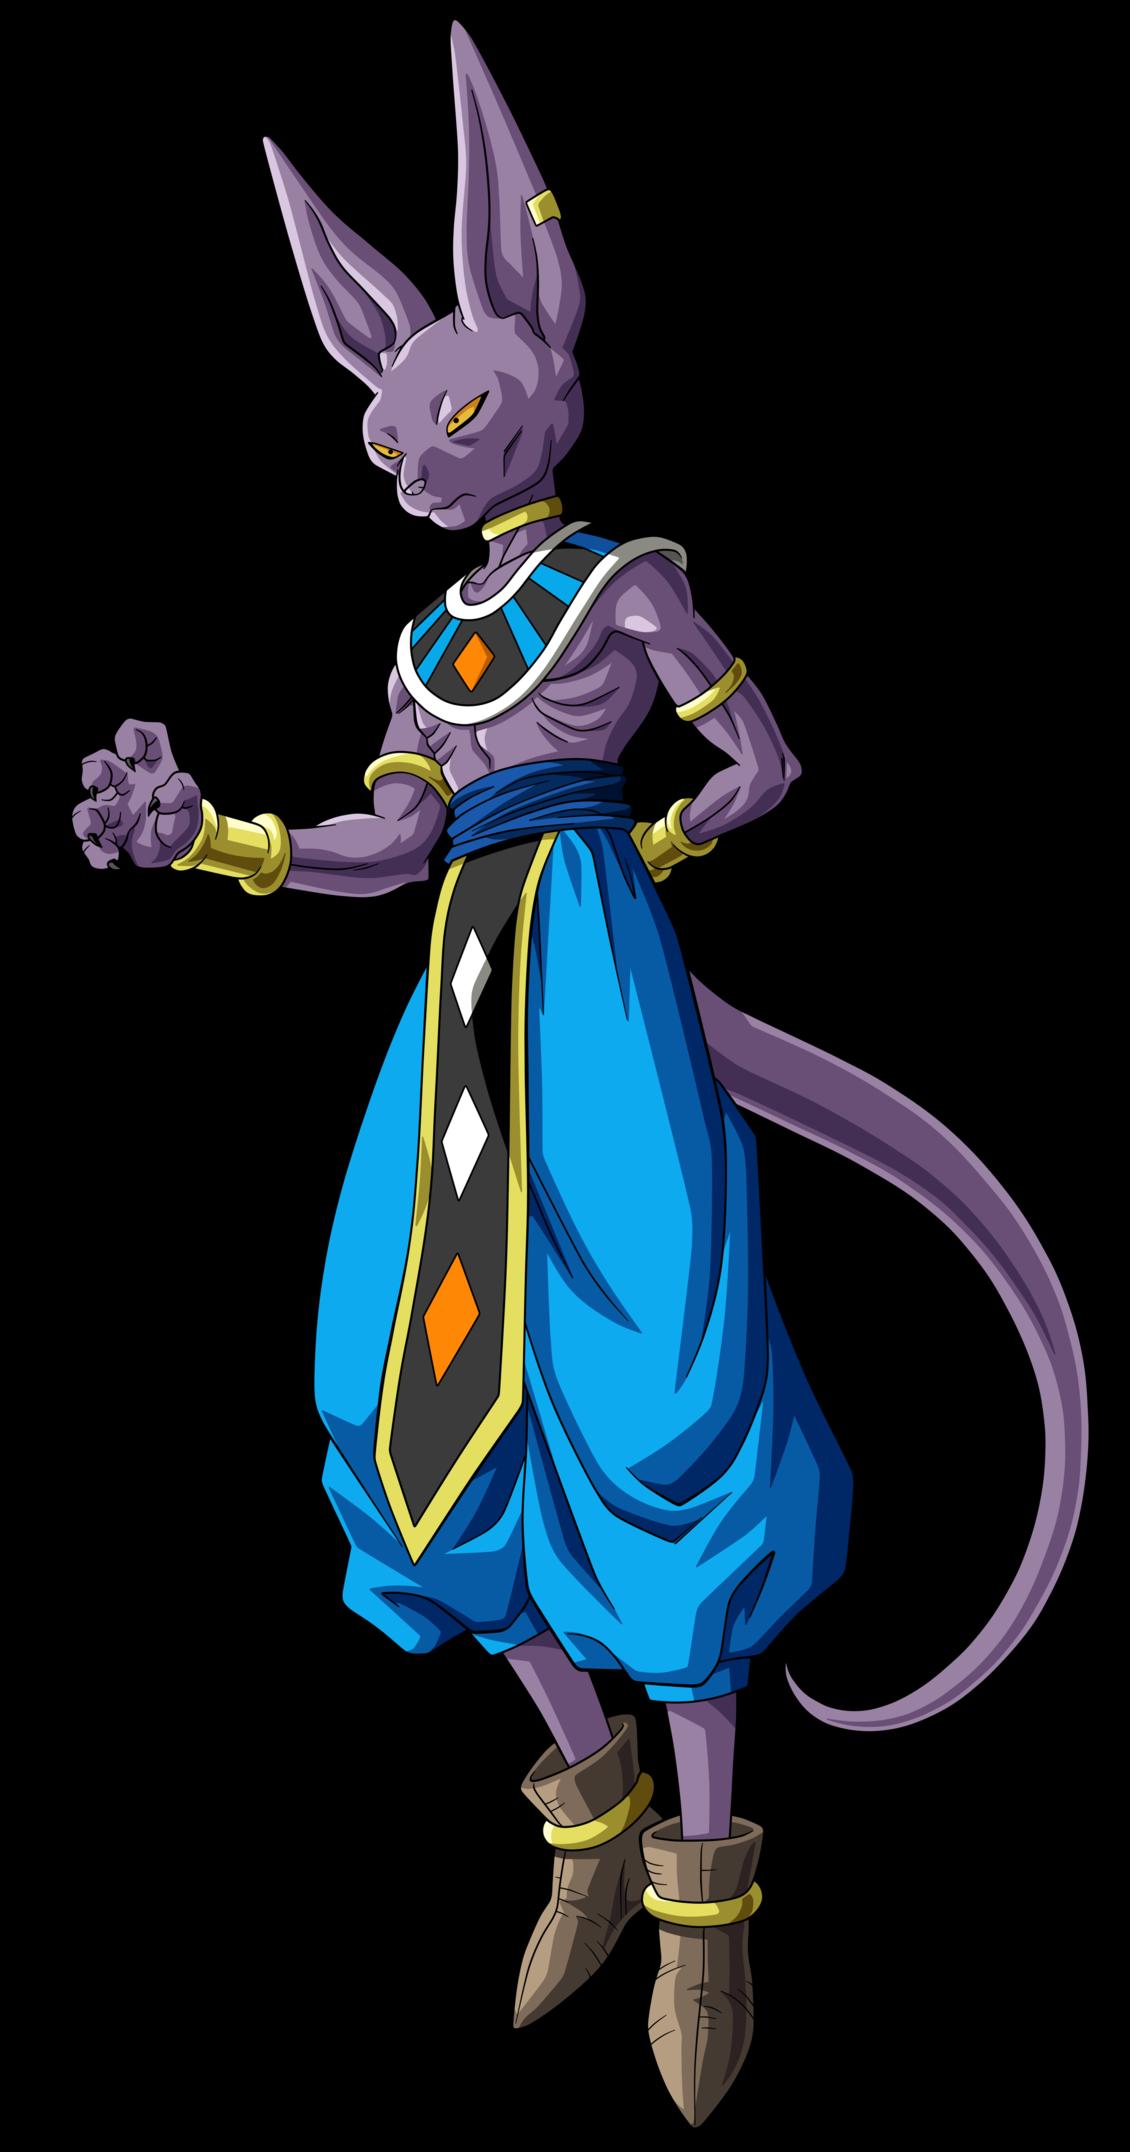 Beerus Dragon Ball Super Wiki Fandom